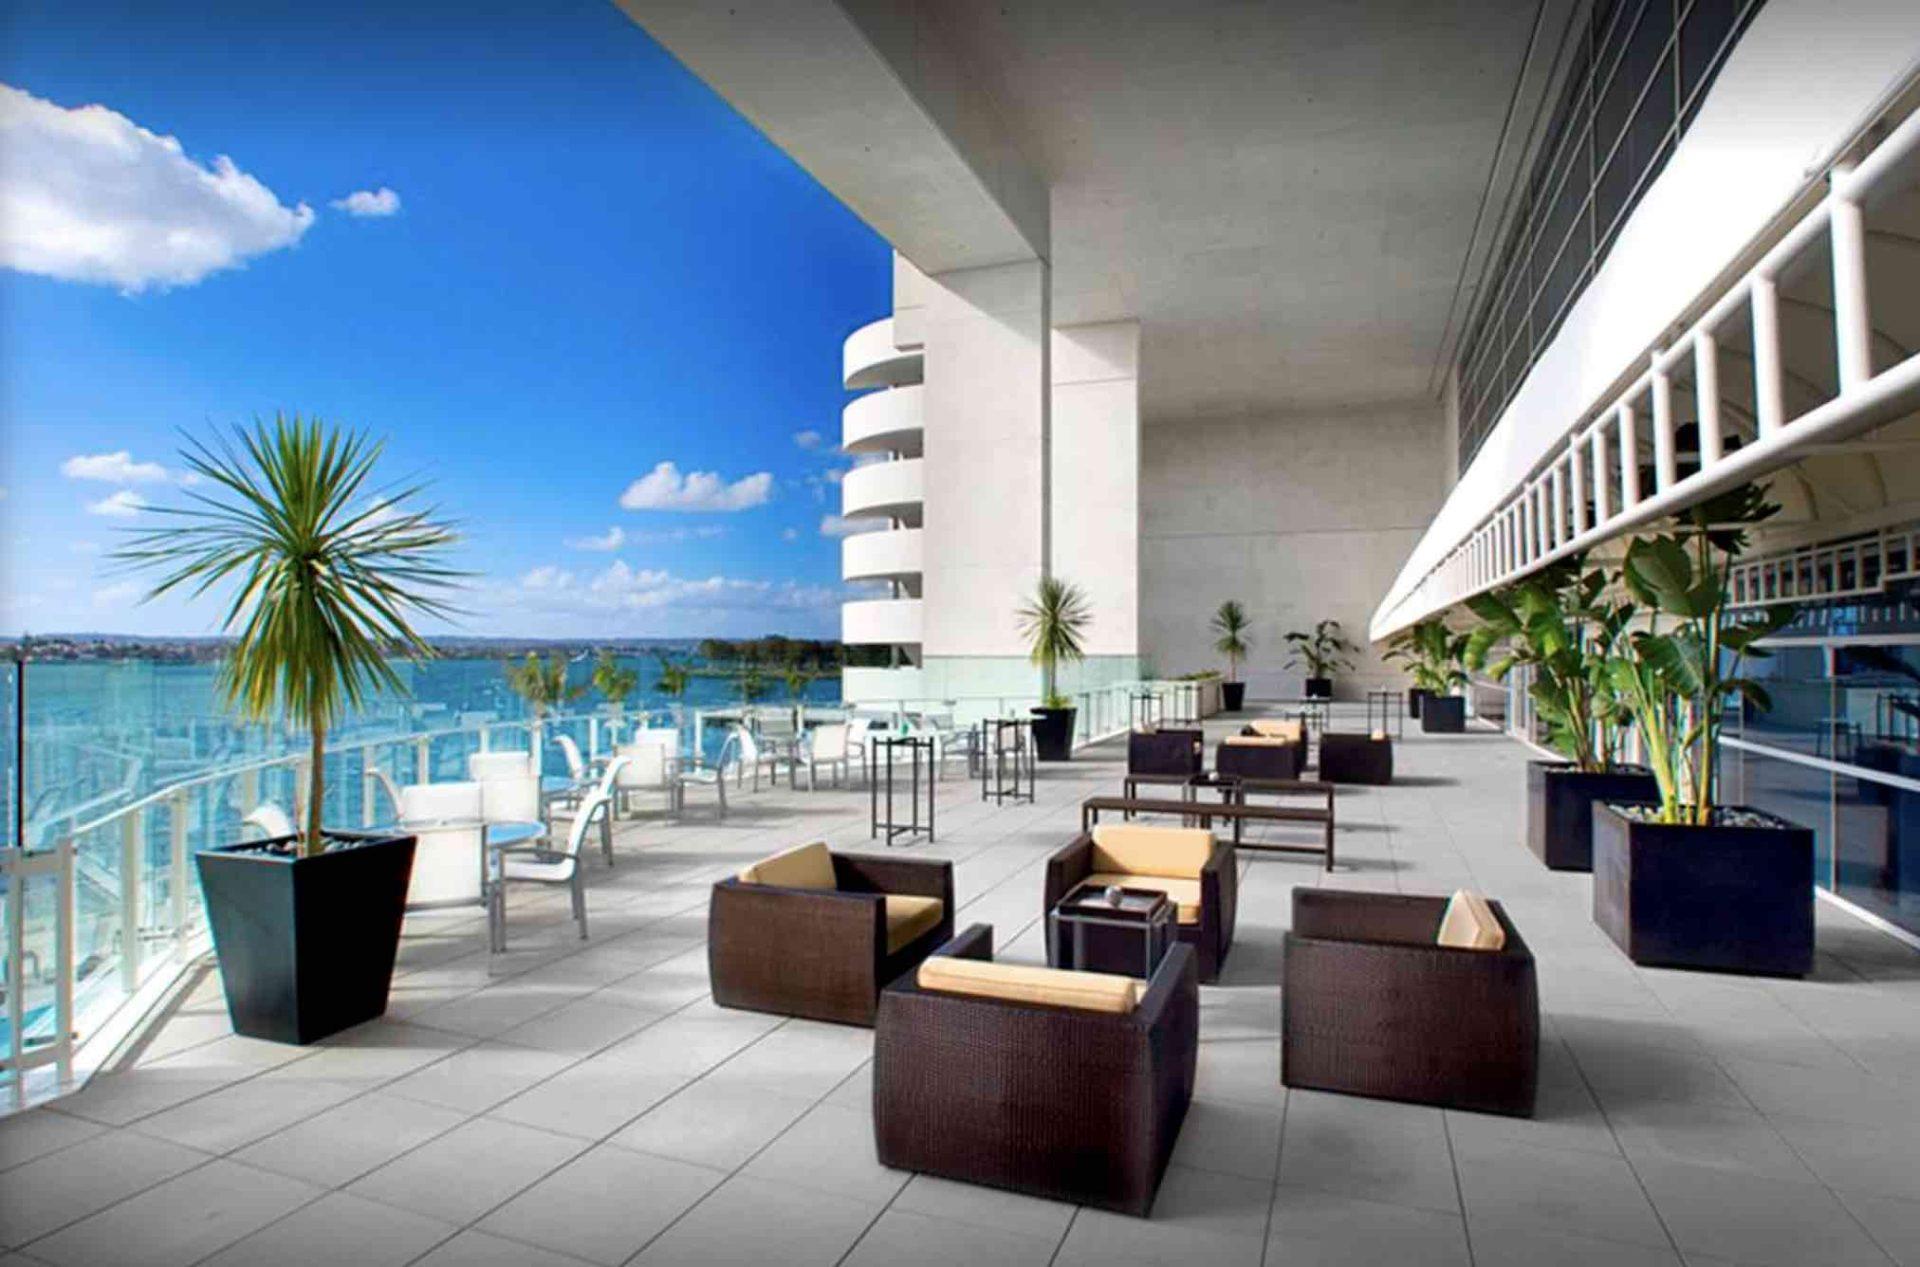 Event - Article - Image - 2019-07-03 - Hilton Bayfront Social Esri Water copy